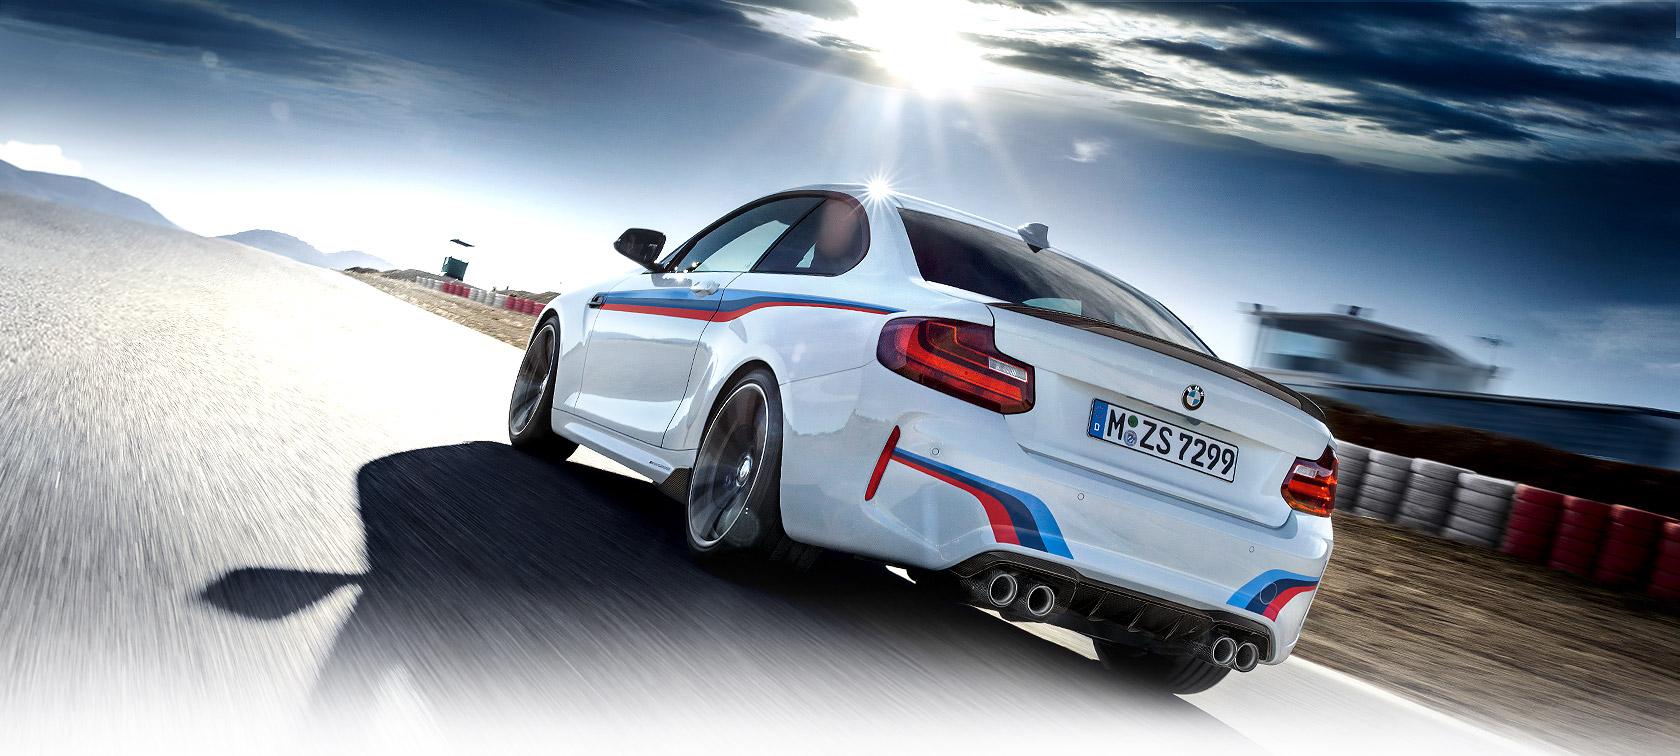 01e4e2221b6a Offers   services - Original BMW accessories - BMW M Performance Parts   Overview